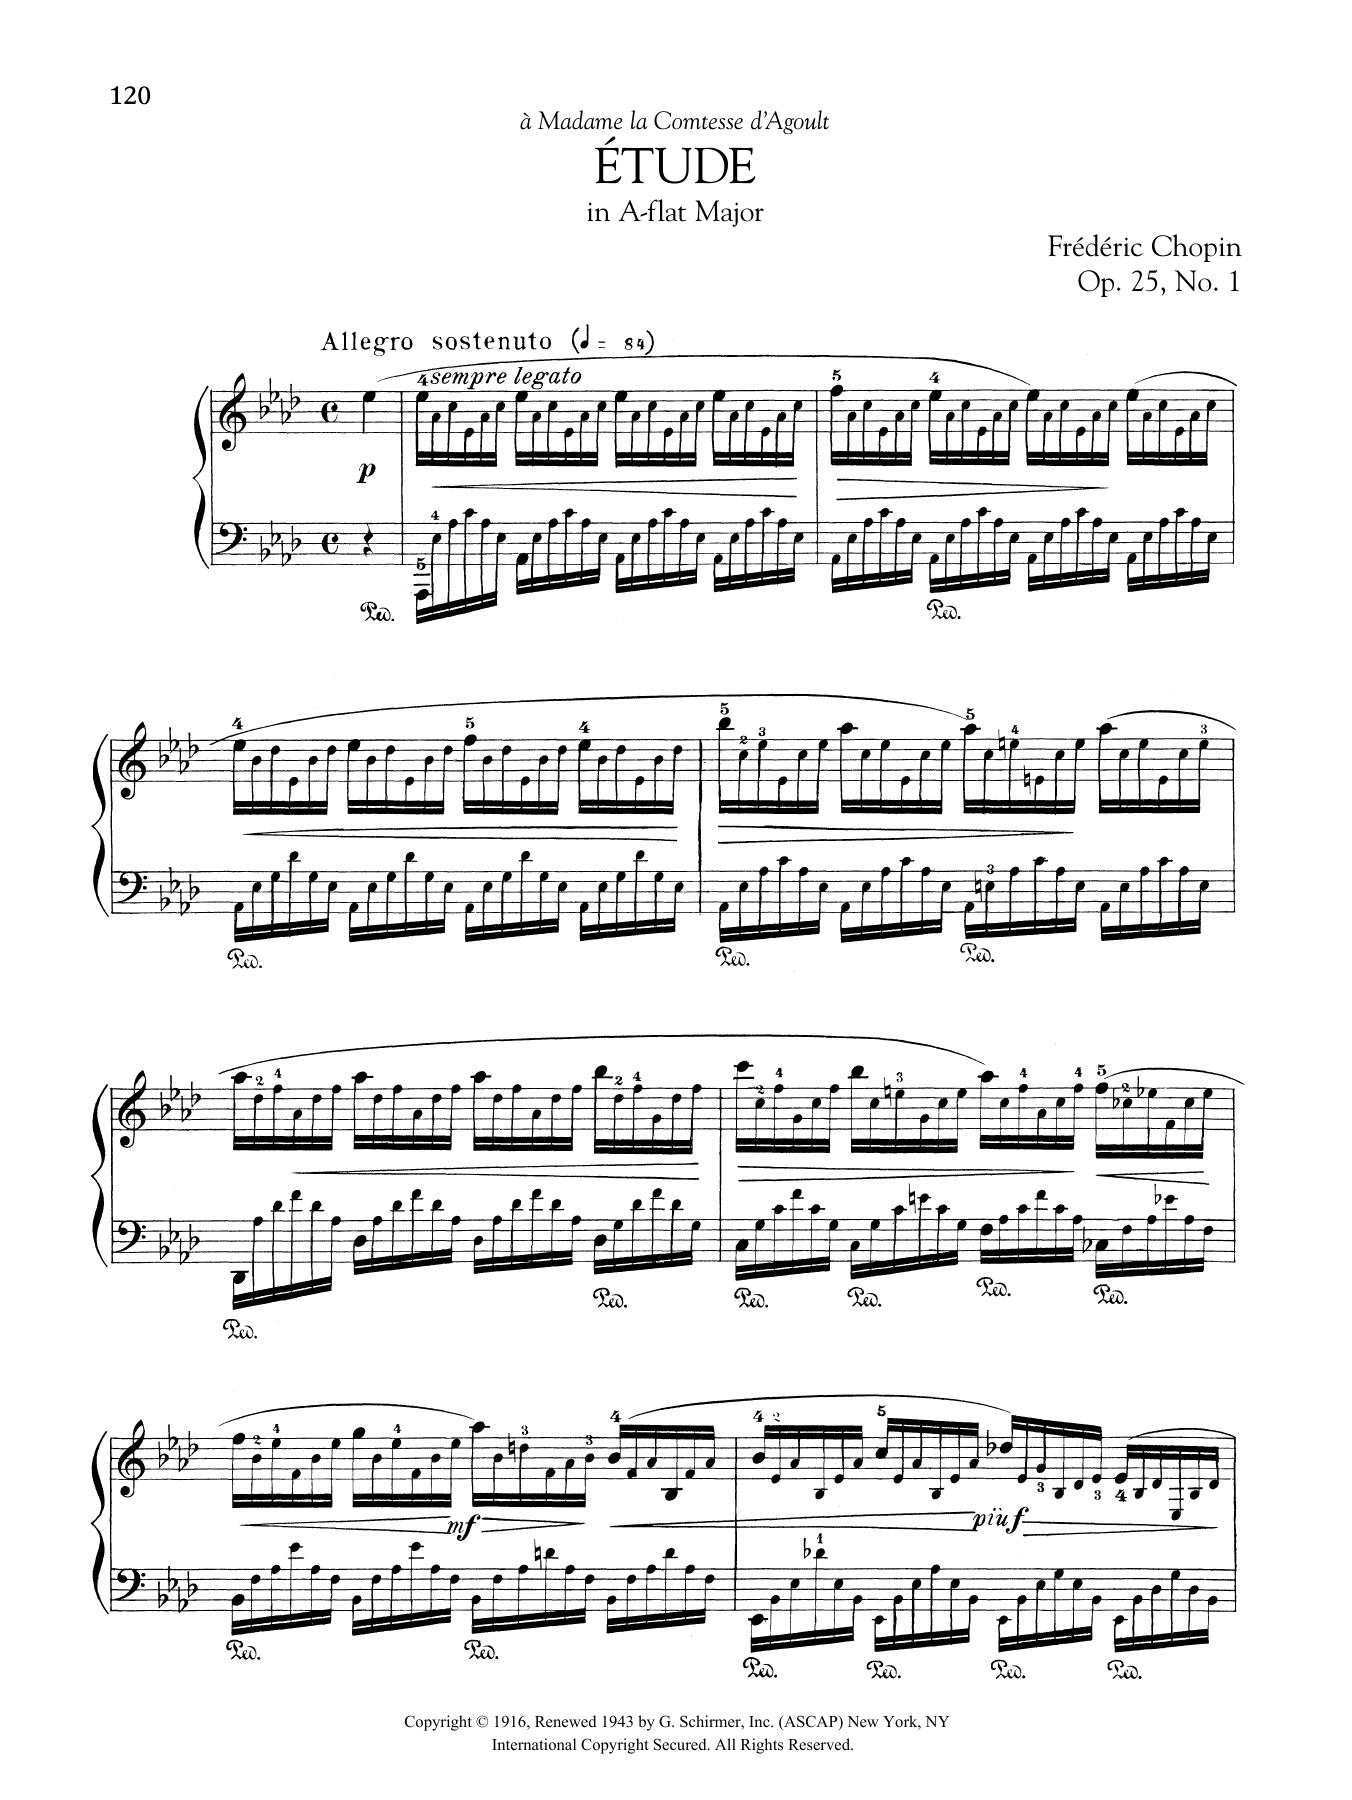 Etude in A-flat Major, Op. 25, No. 1 Sheet Music